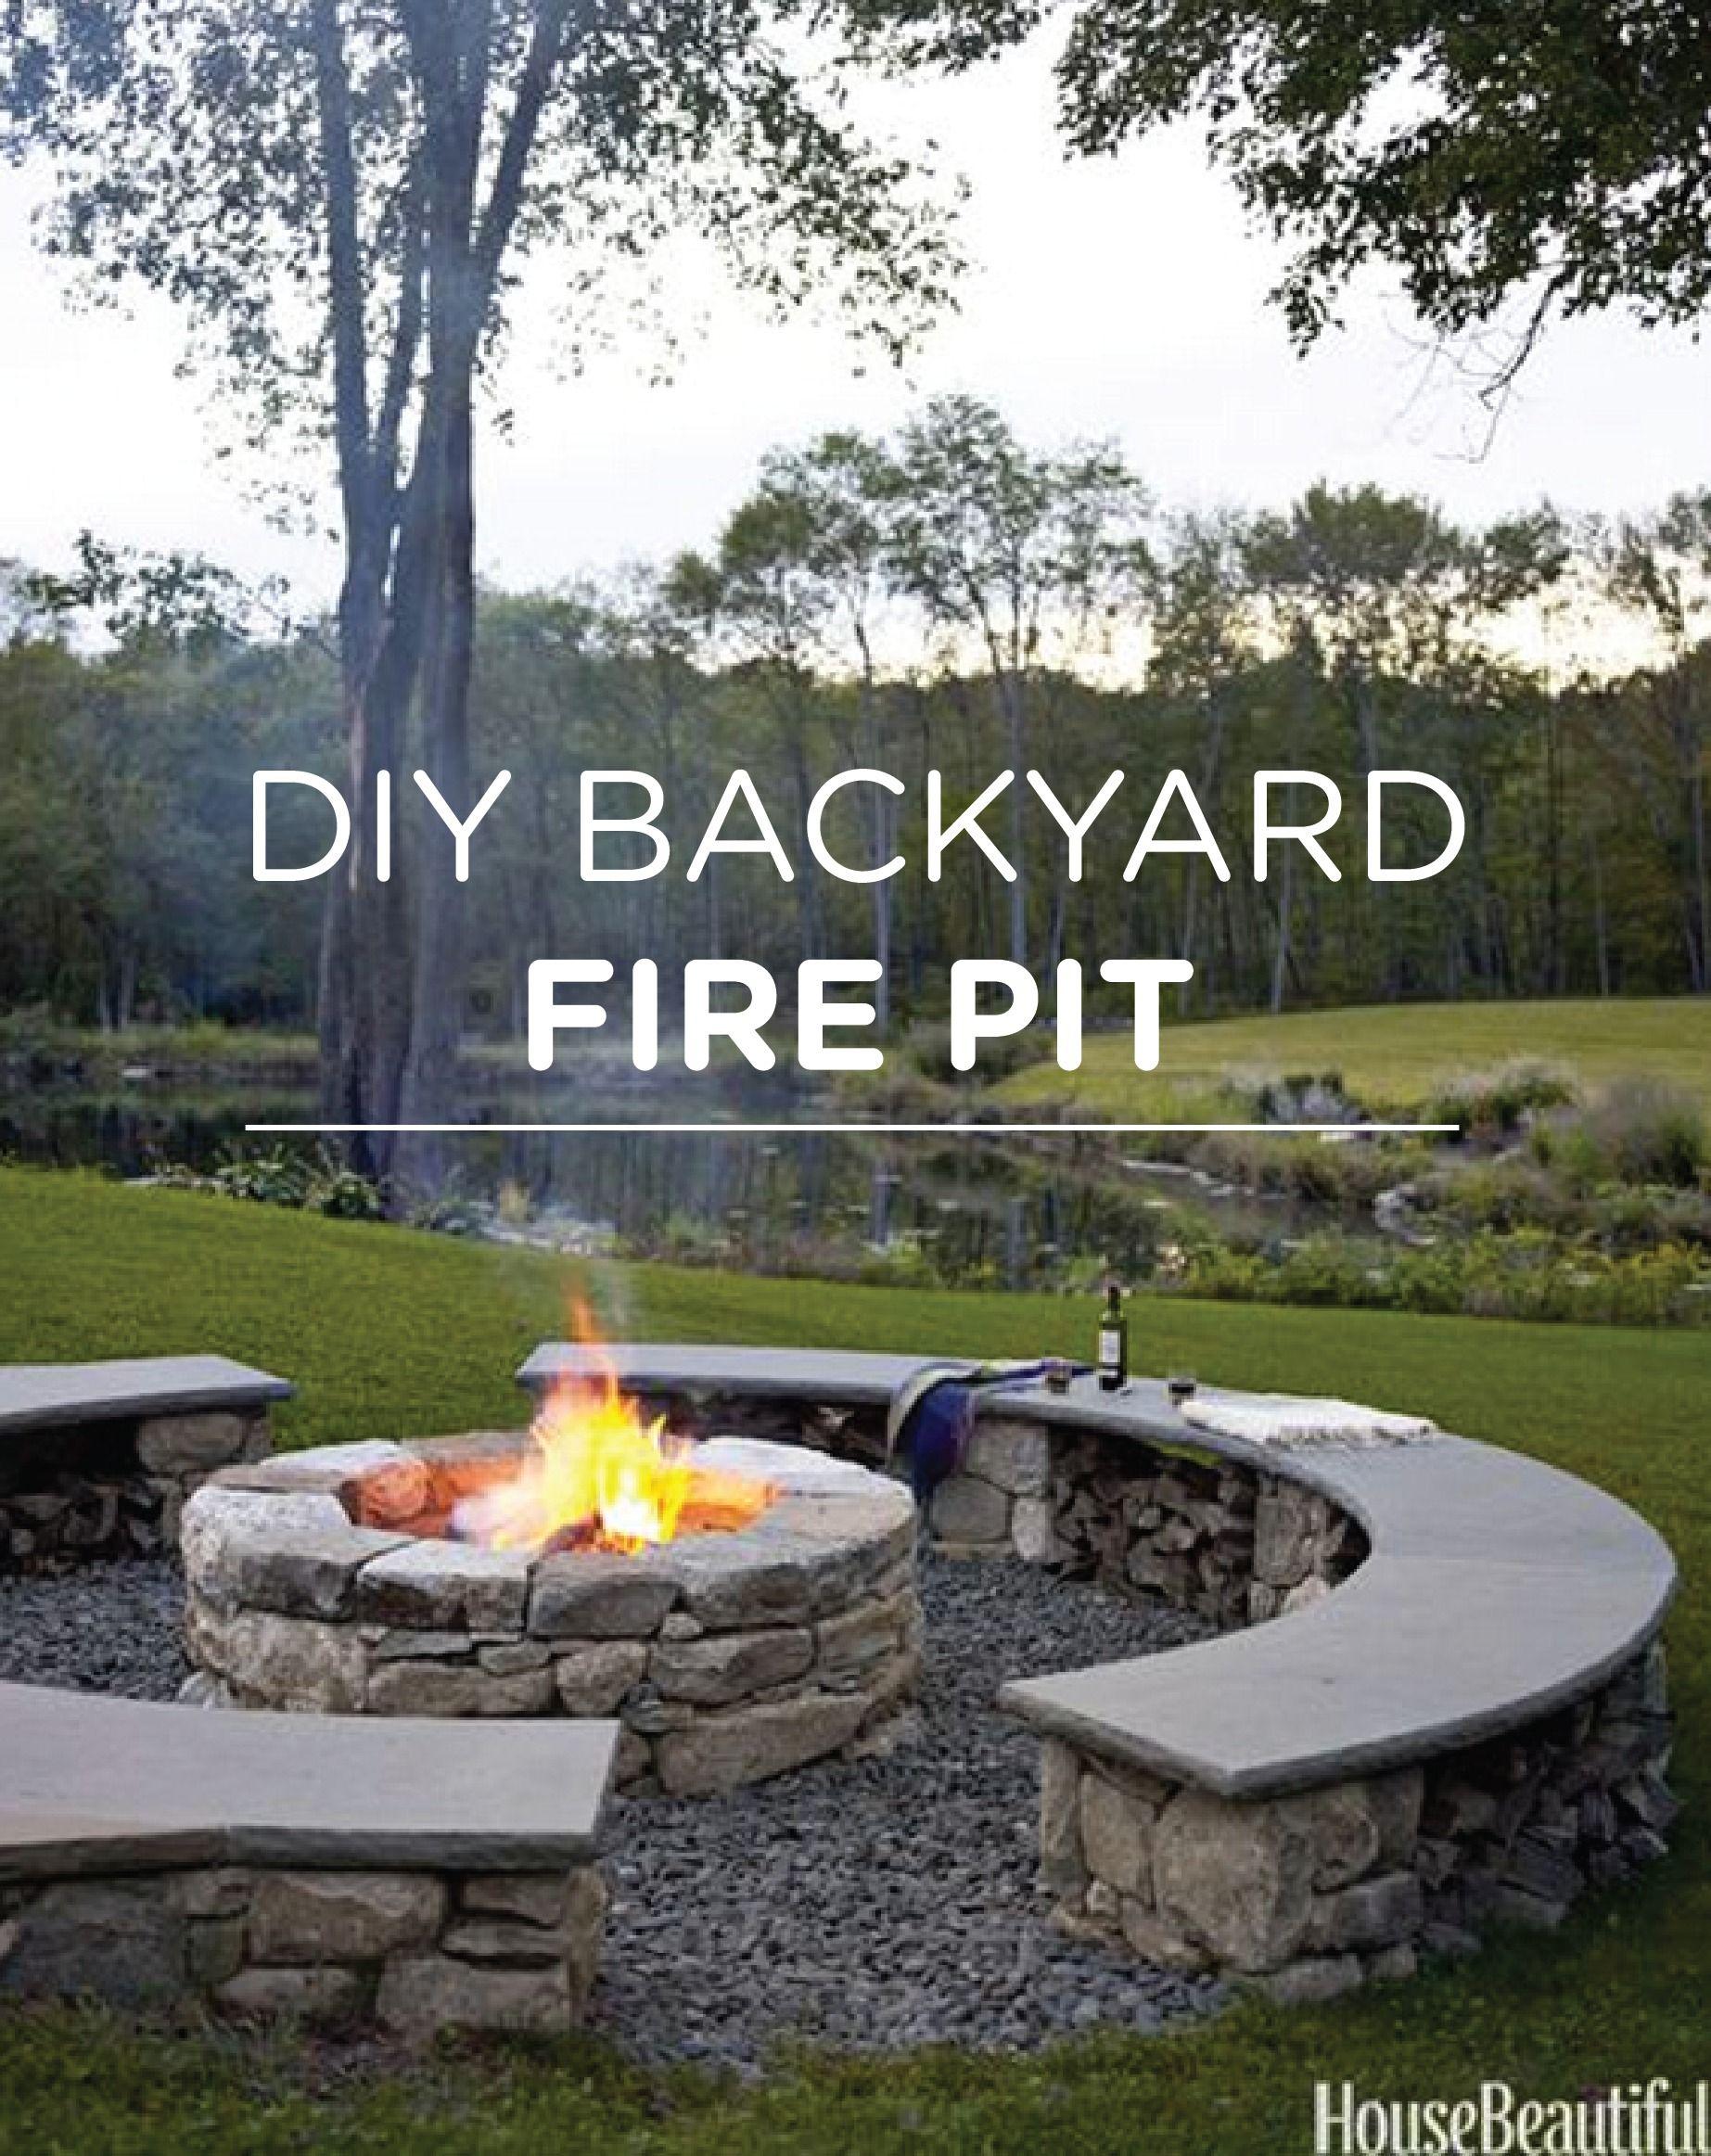 732b2fce2d1e173b5c4770b7766d3140 Top Result 50 Awesome Cost Of Outdoor Fireplace Picture 2018 Zat3